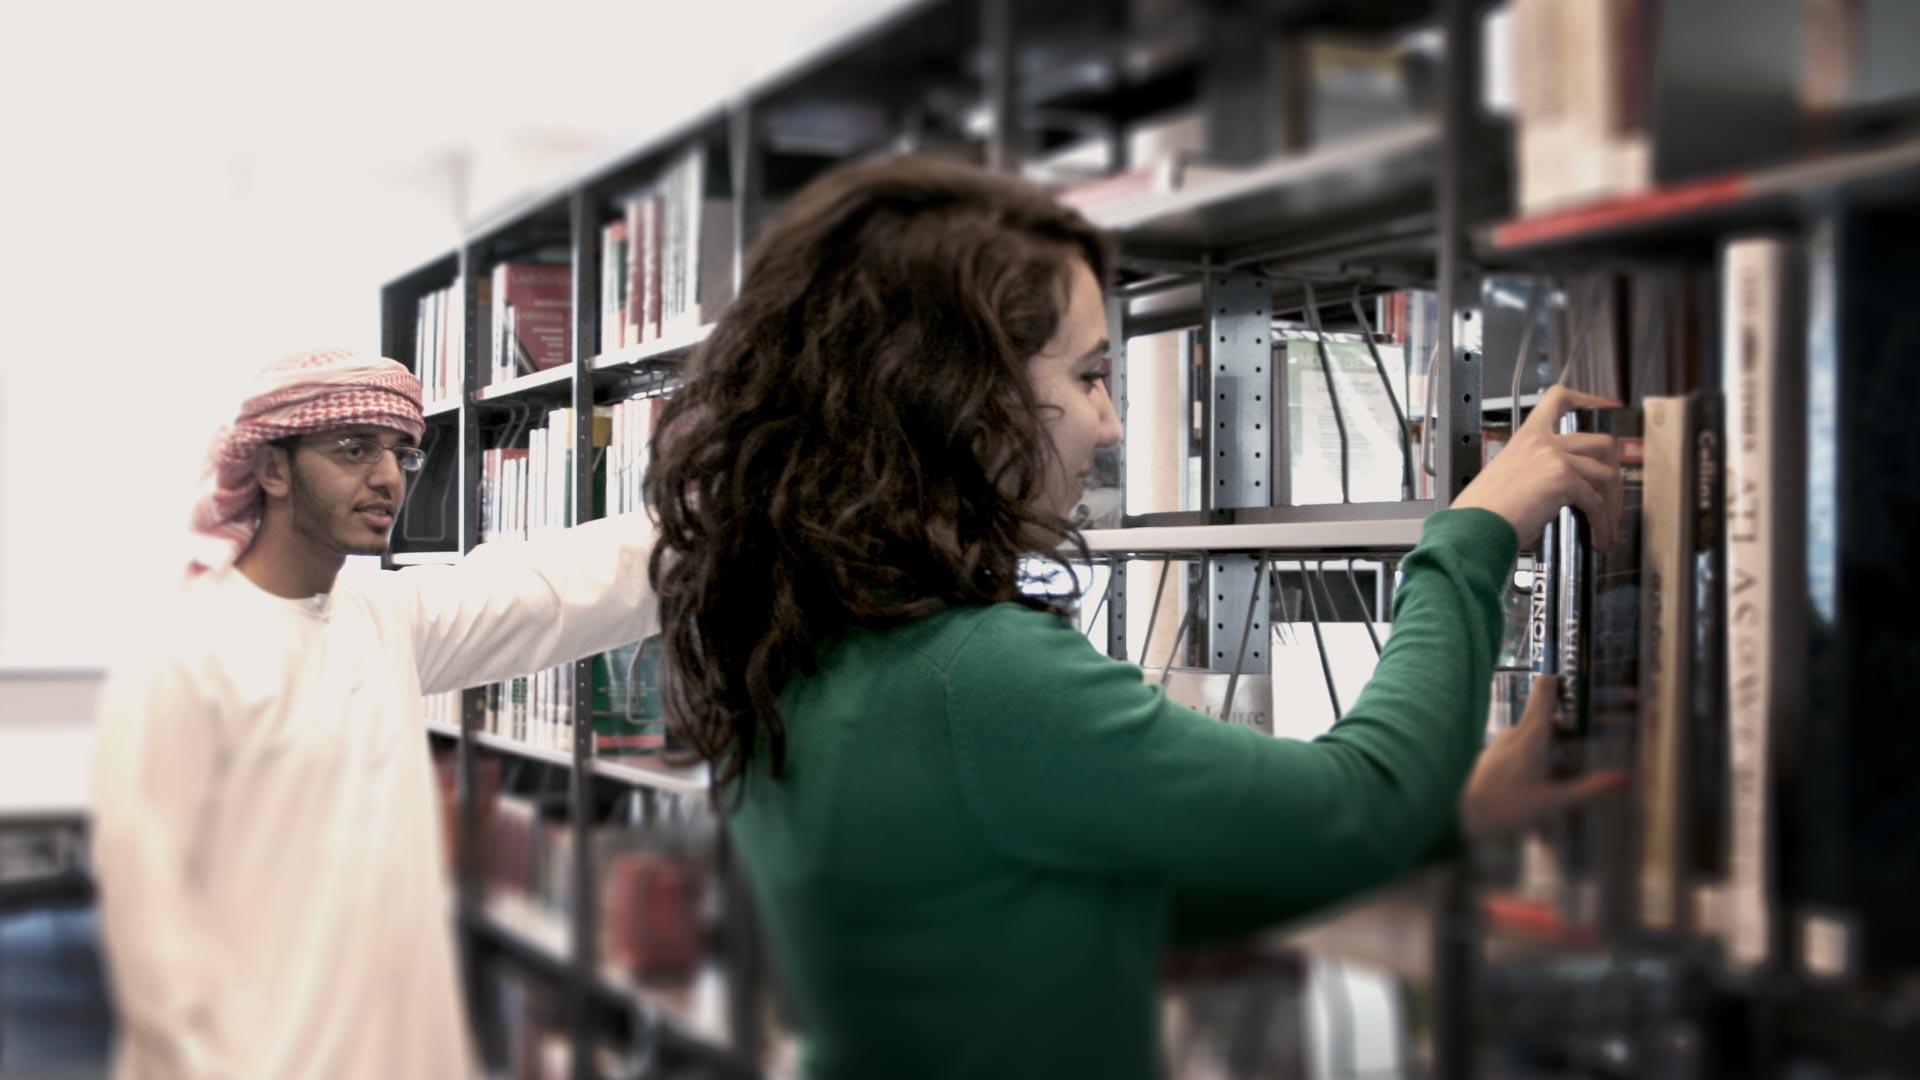 Sorbonne University Abu Dhabi Library